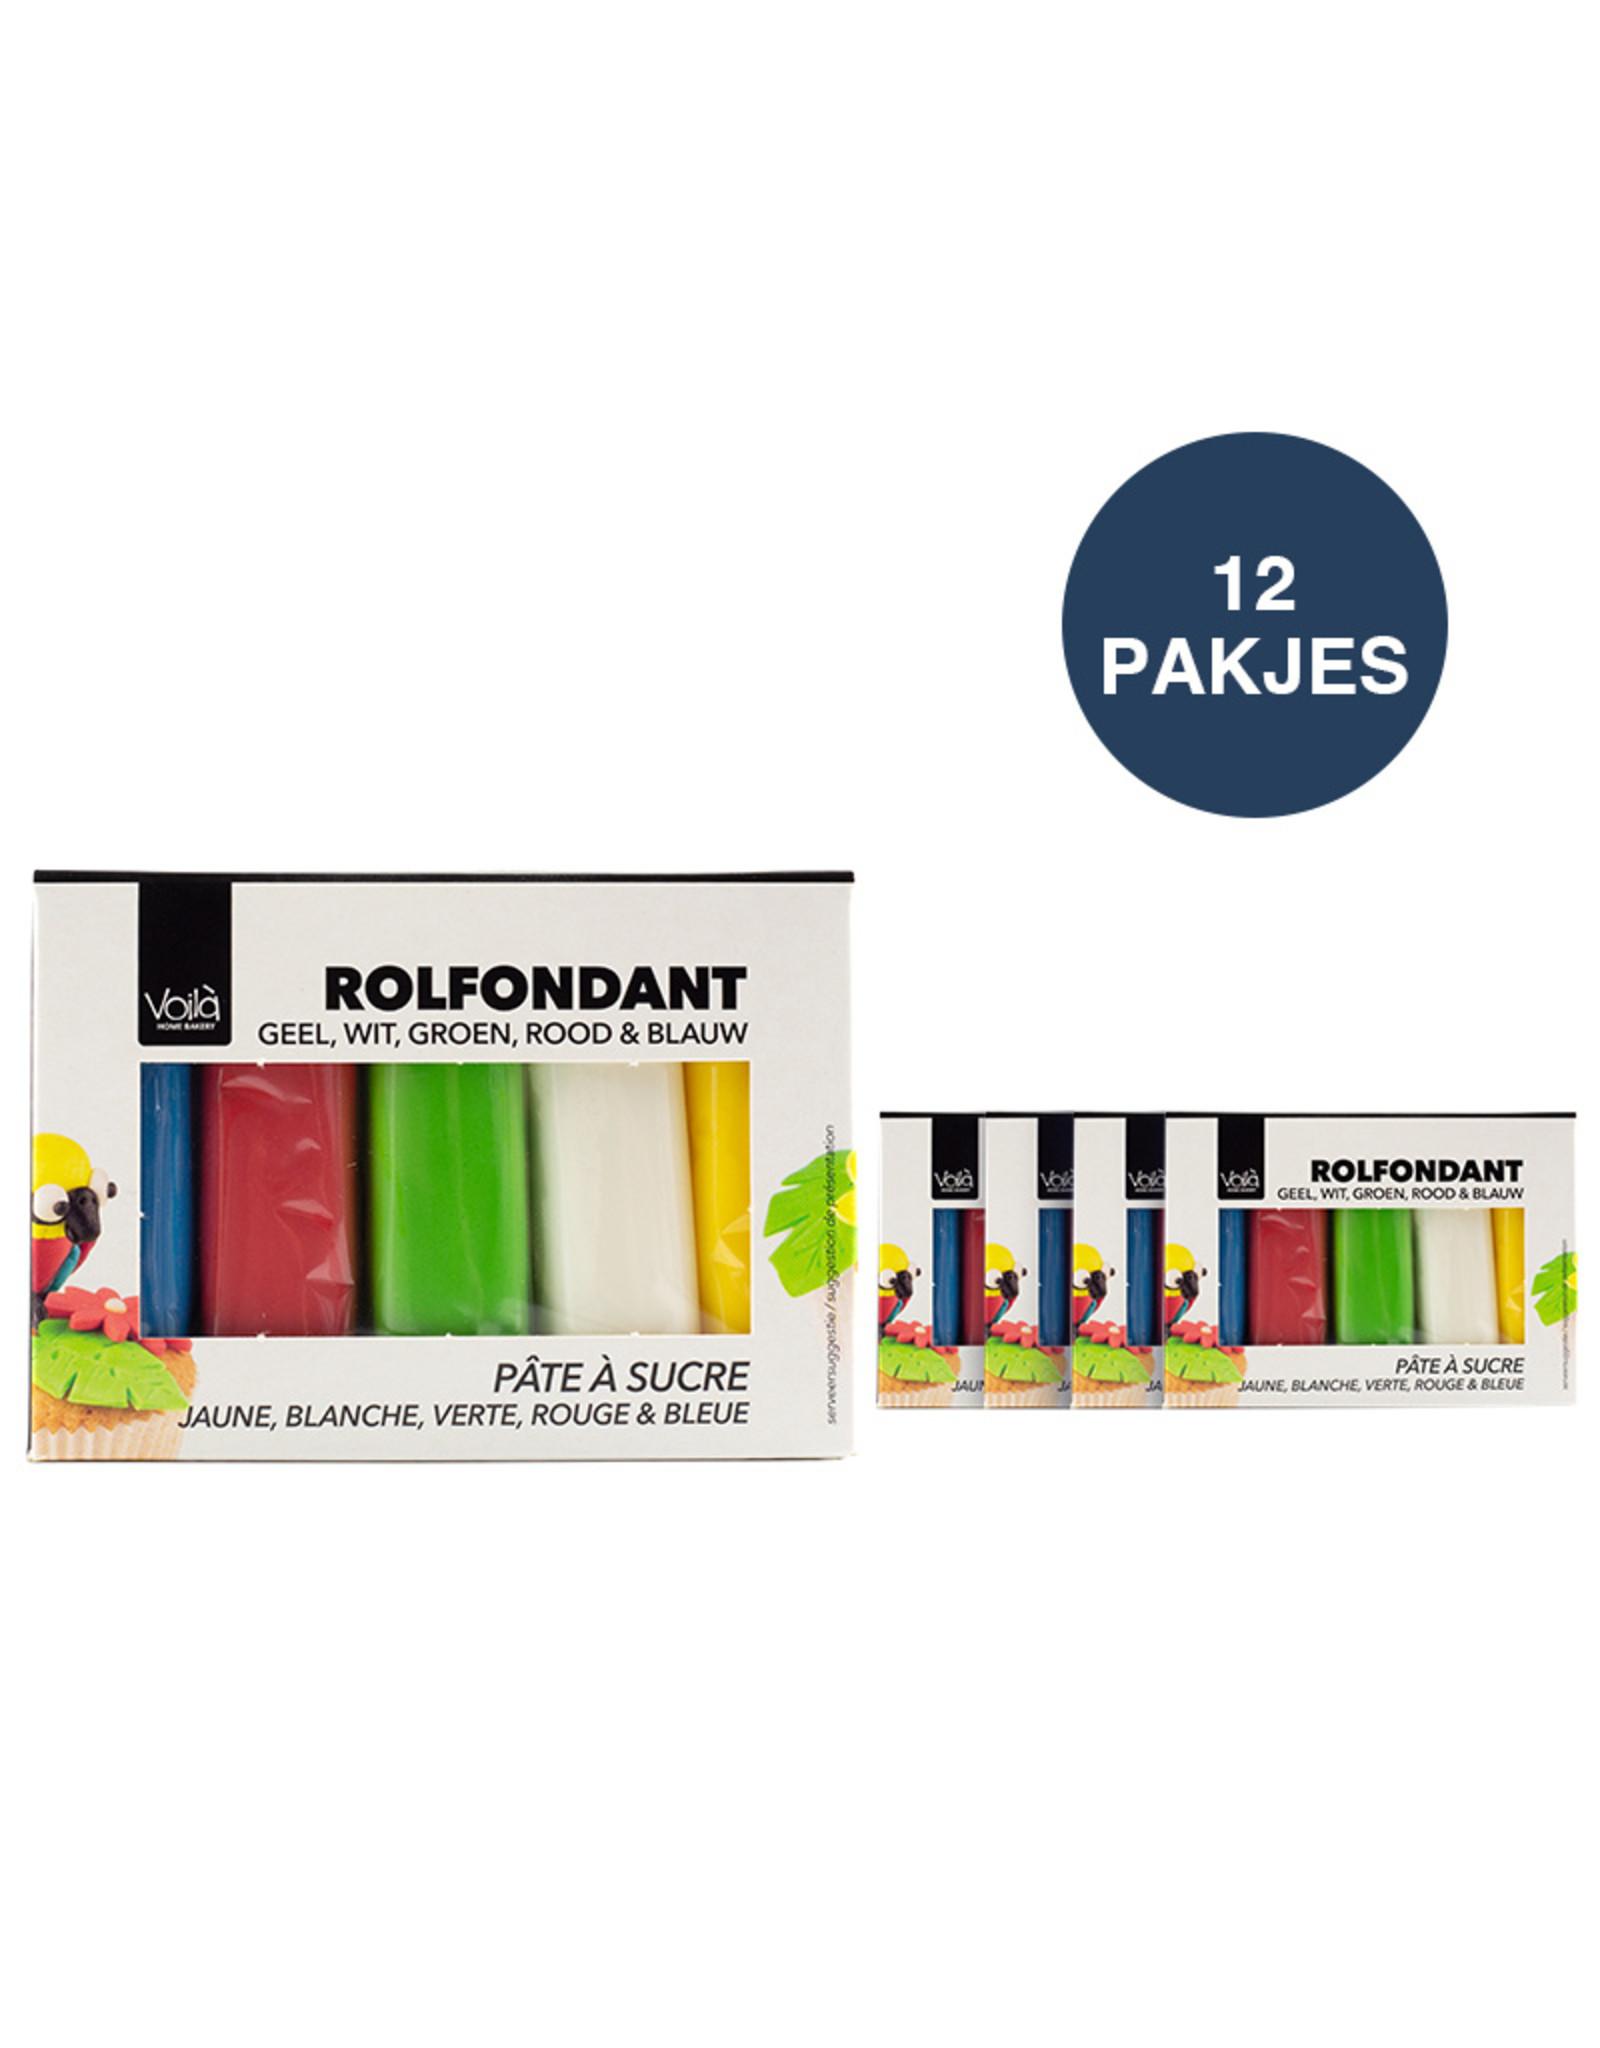 VOILA Home Bakery Voila Fondant Assortment Multipack Different Colors 12x 500 gr.- master carton (6 kgs)